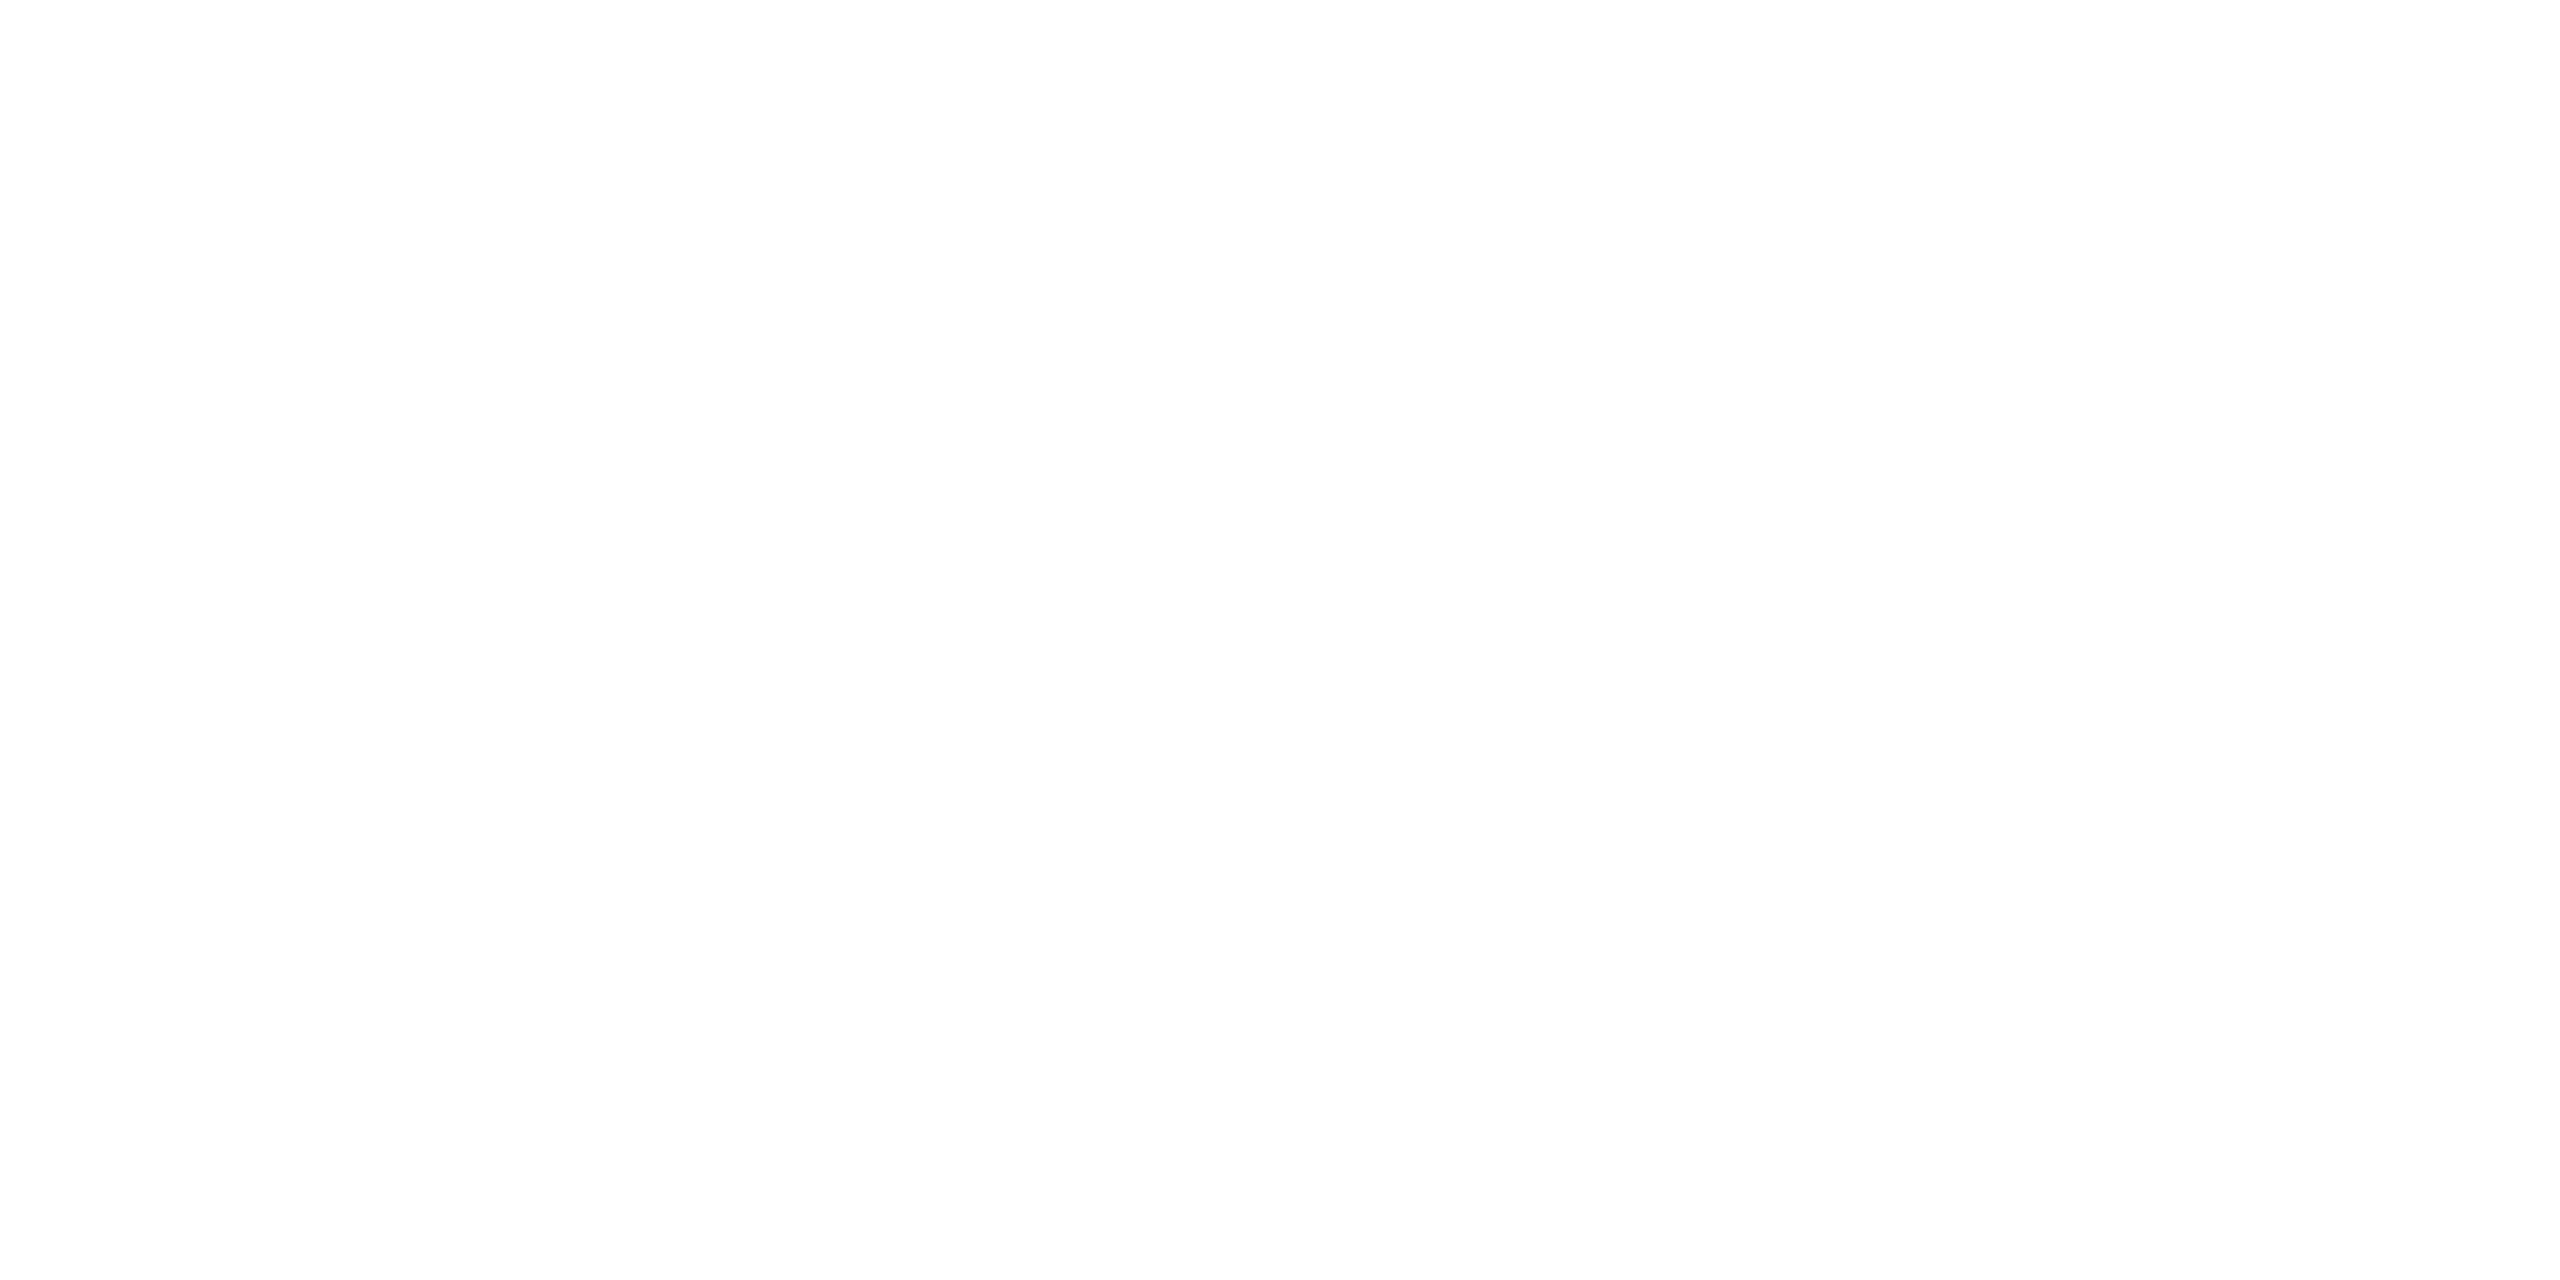 zazzleLetterform_white